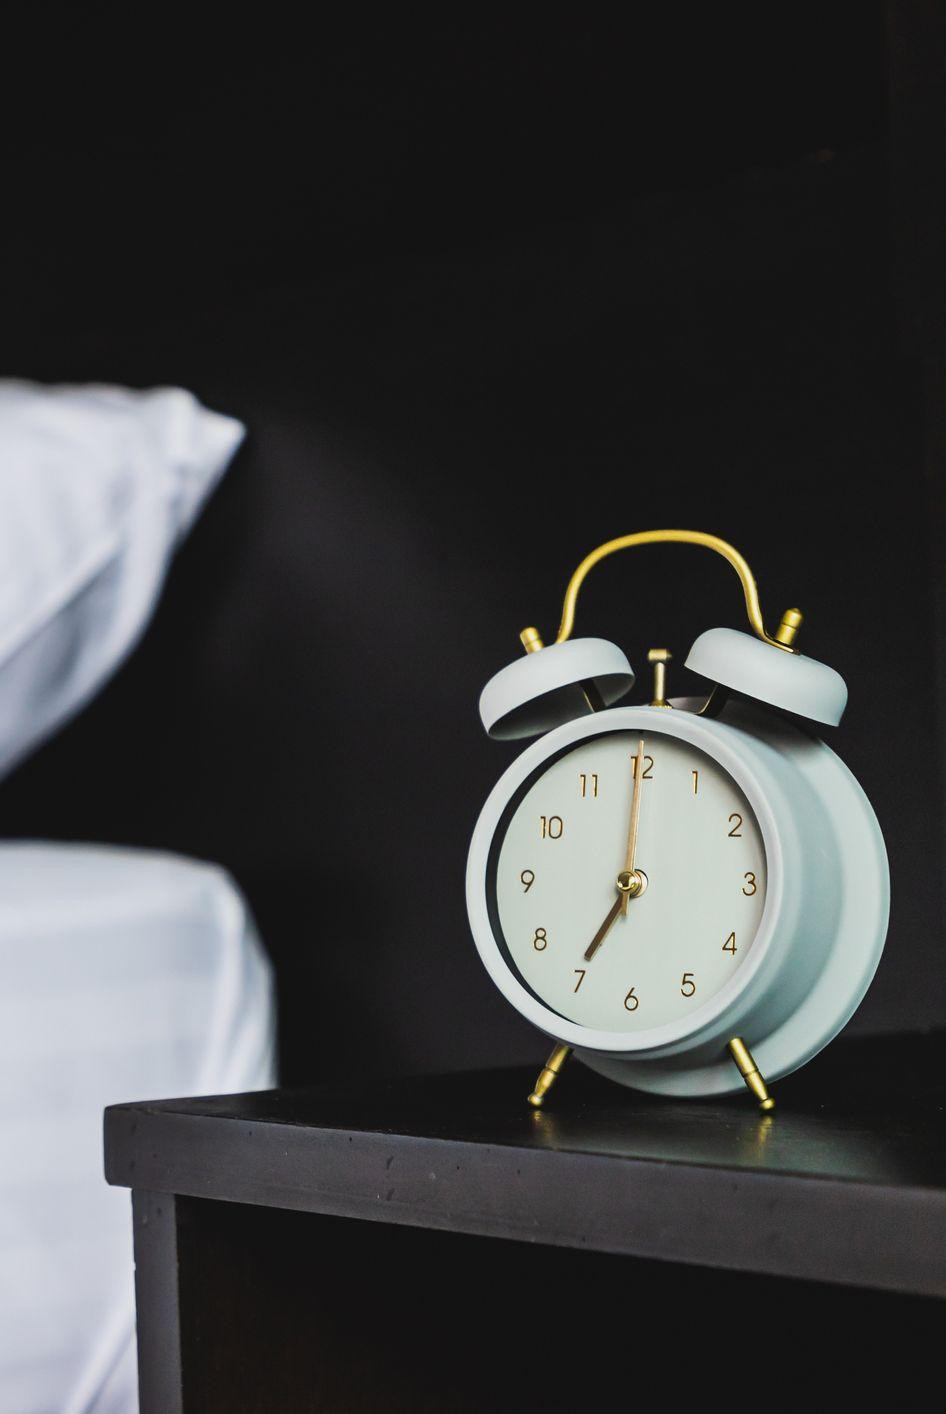 1. Reserve Mornings for Deep Work